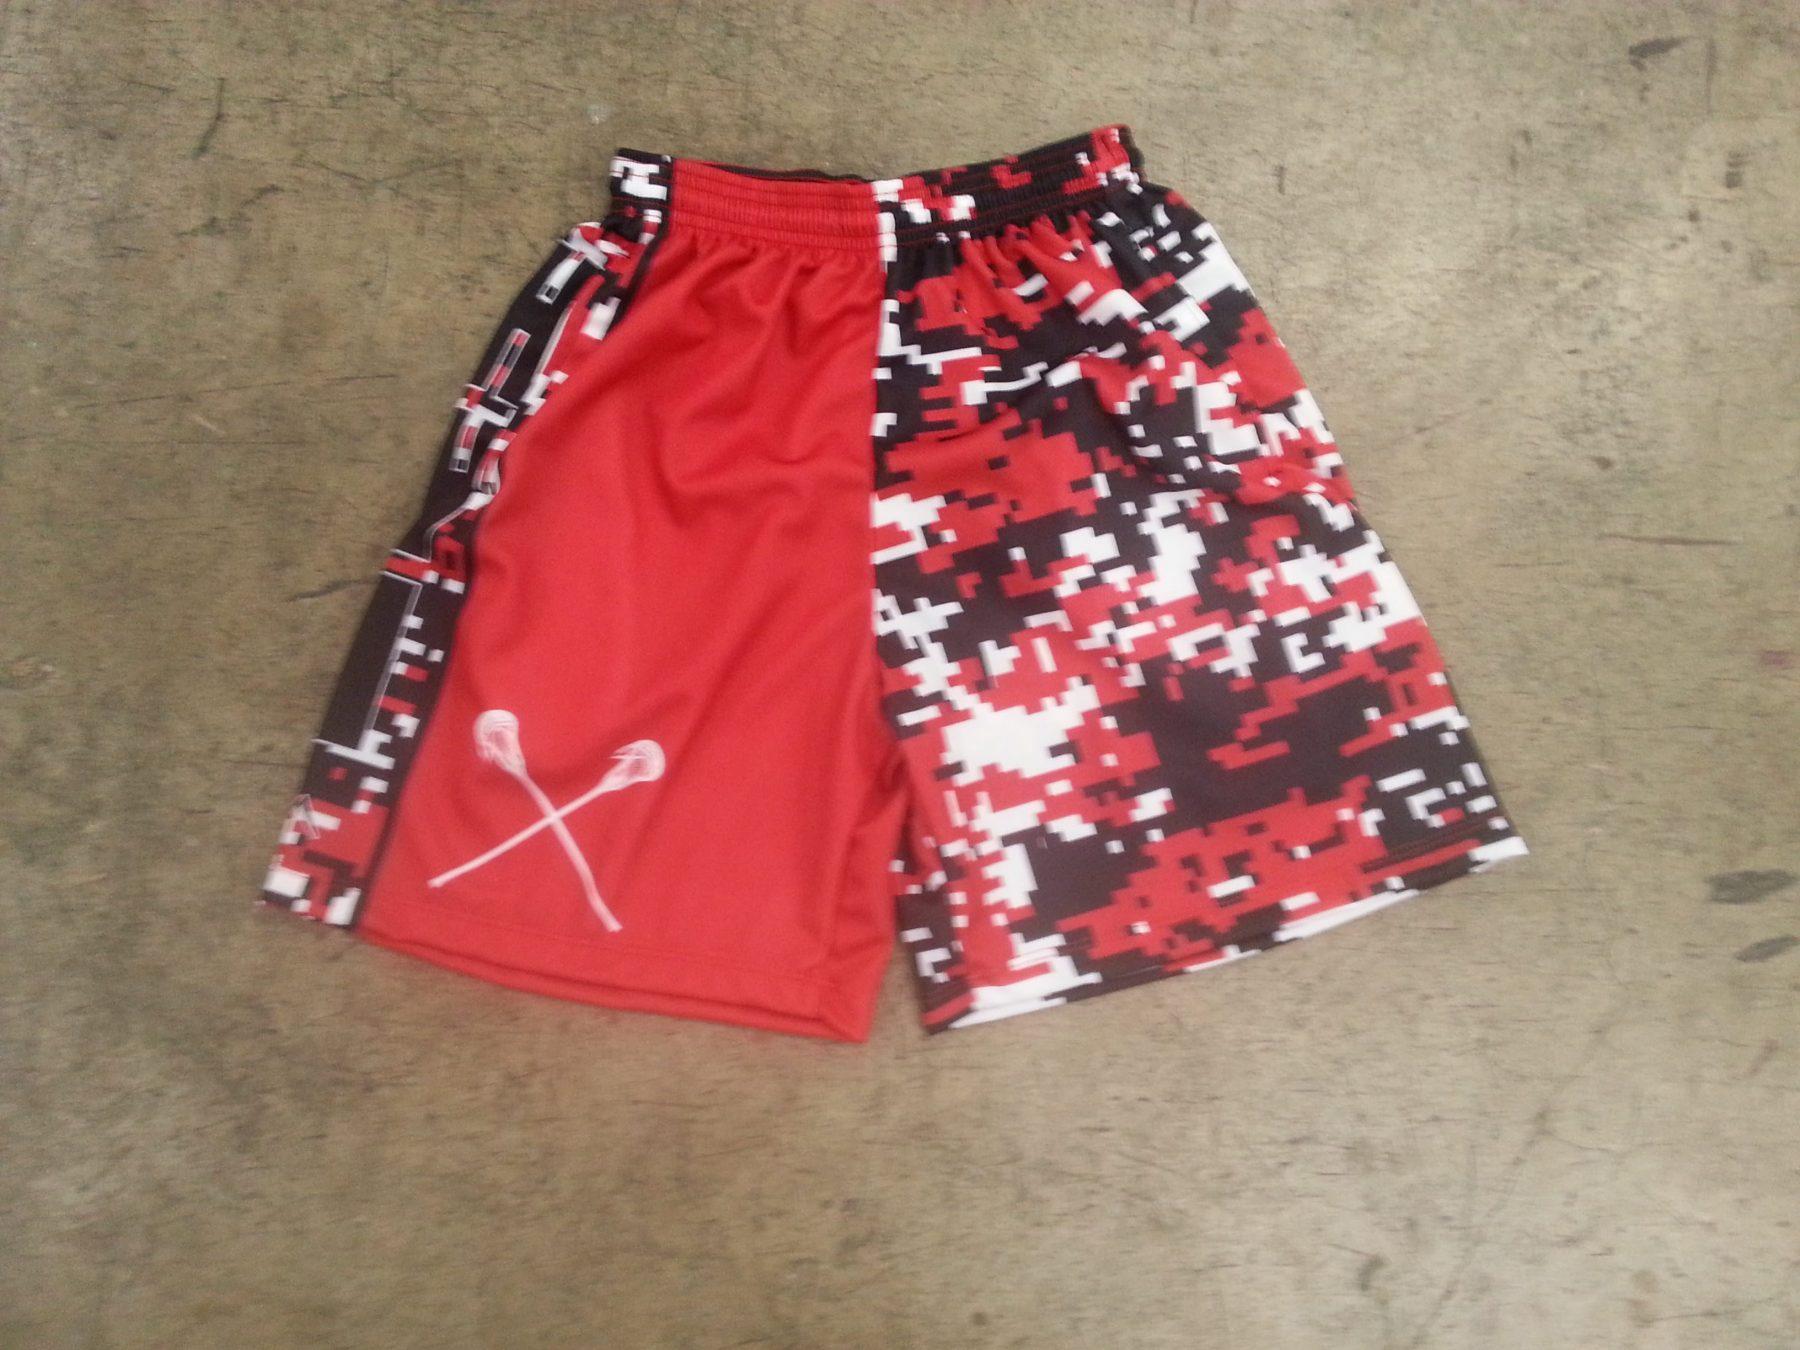 lacrosse practice shorts